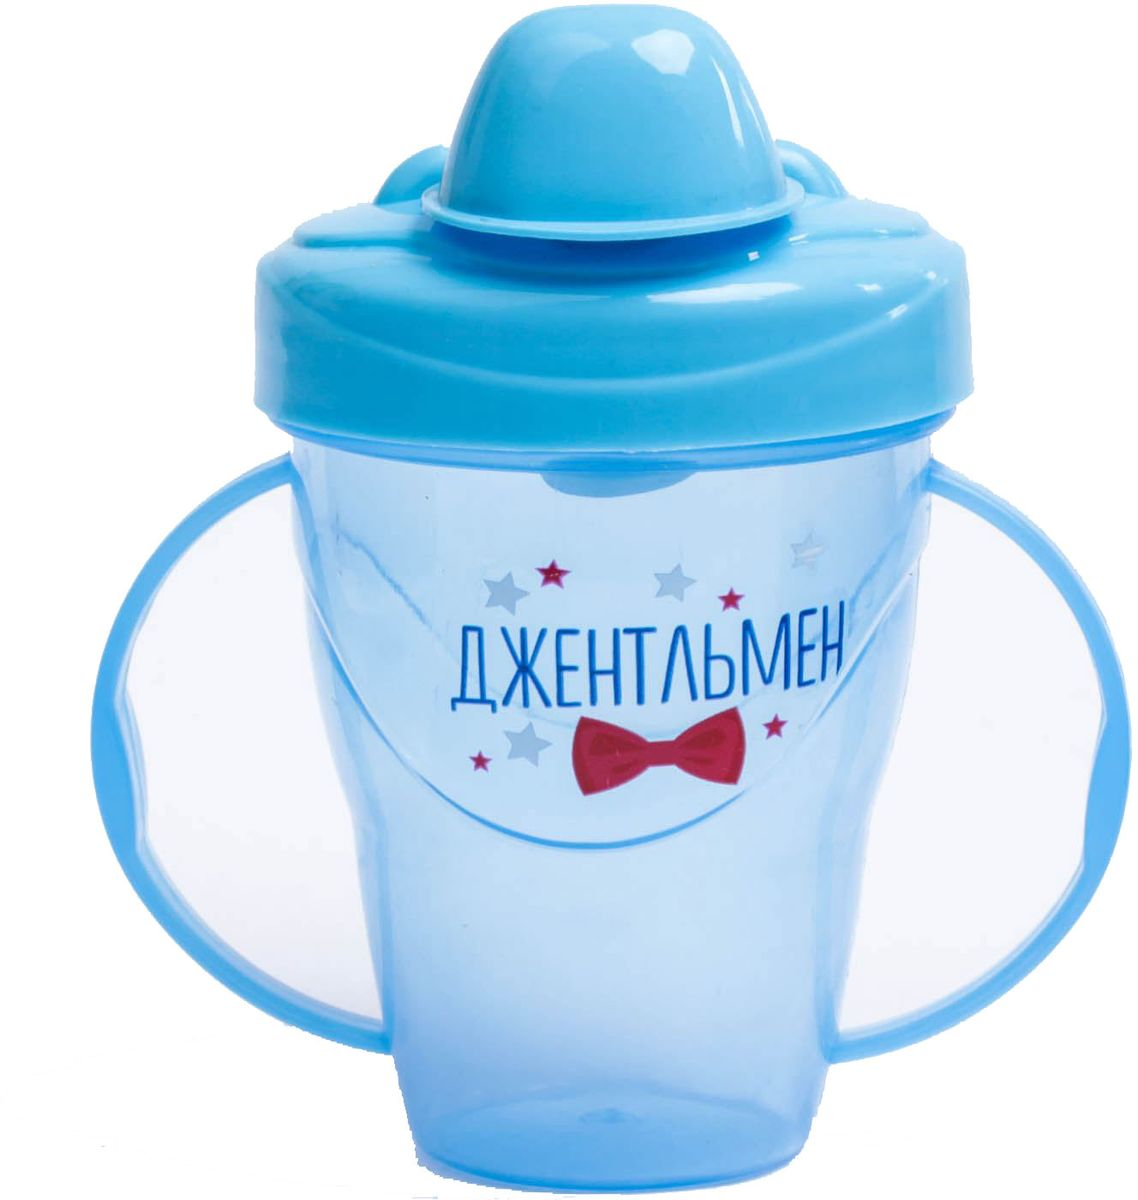 Mum&Baby Поильник-непроливайка Джентльмен цвет голубой 200 мл -  Поильники